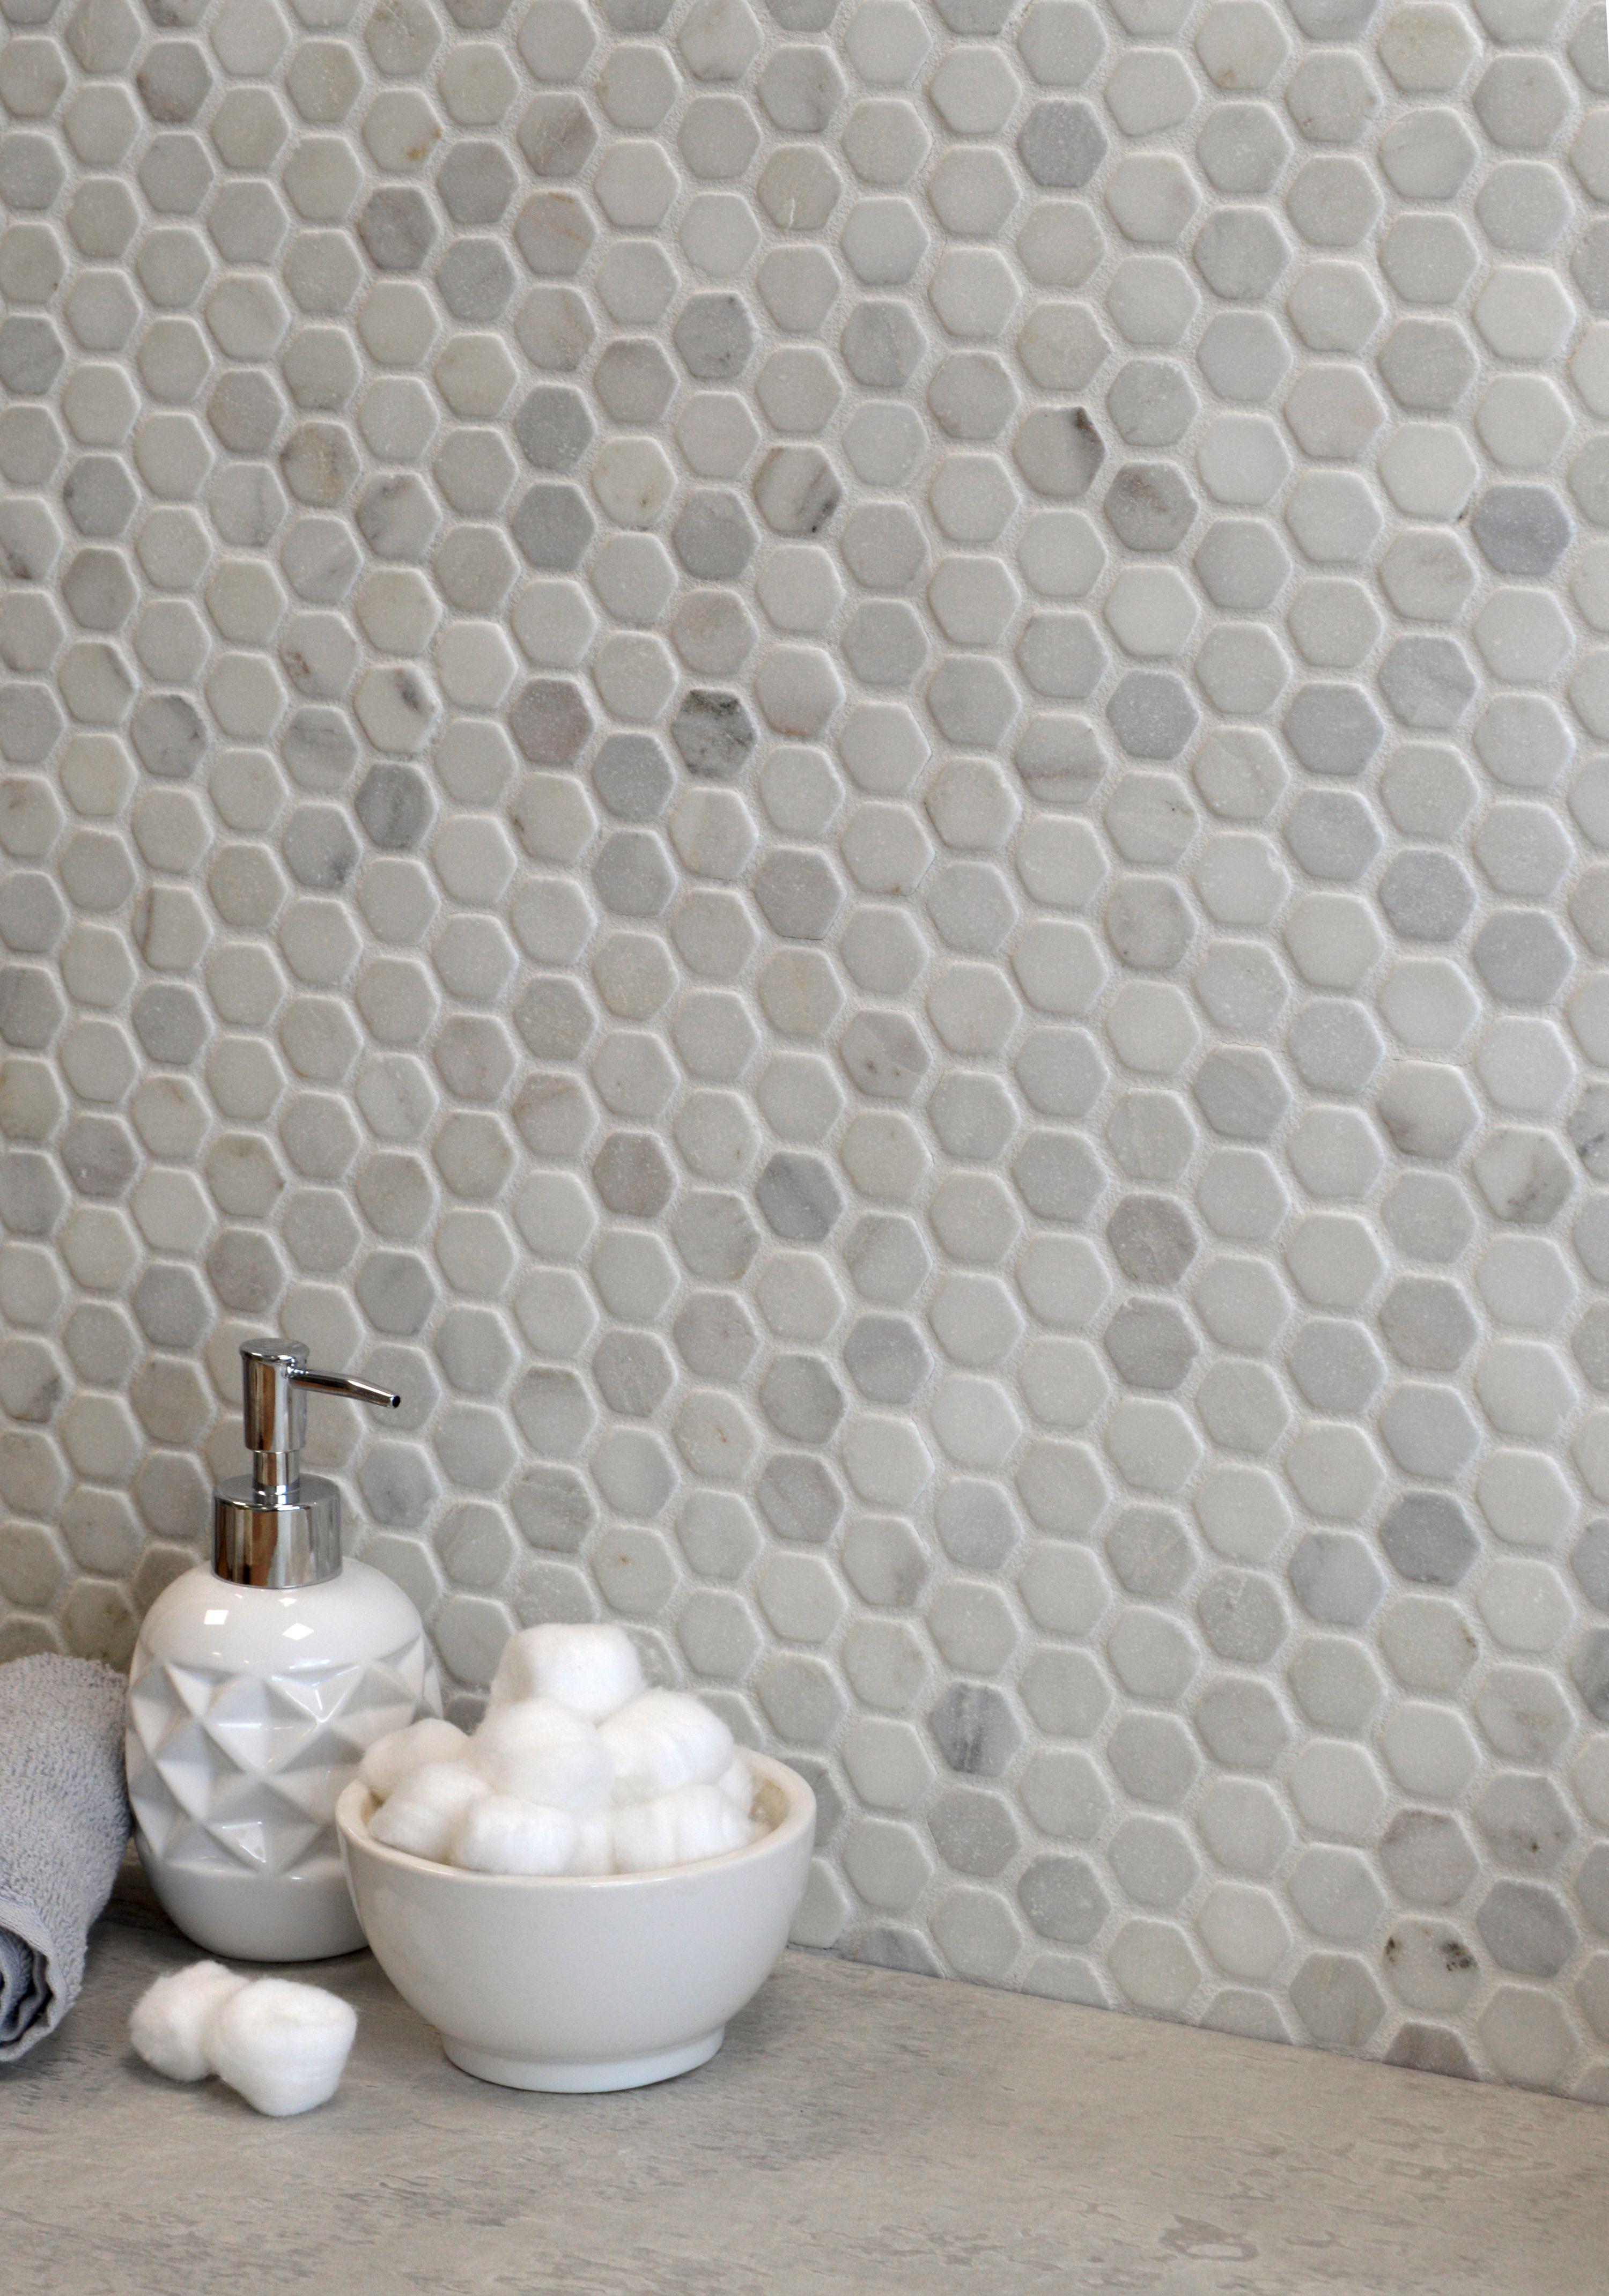 Oriental Blanco Marble Hexagon Mosaic Tiles Hexagon Mosaic Tile Mosaic Tiles Marble Mosaic